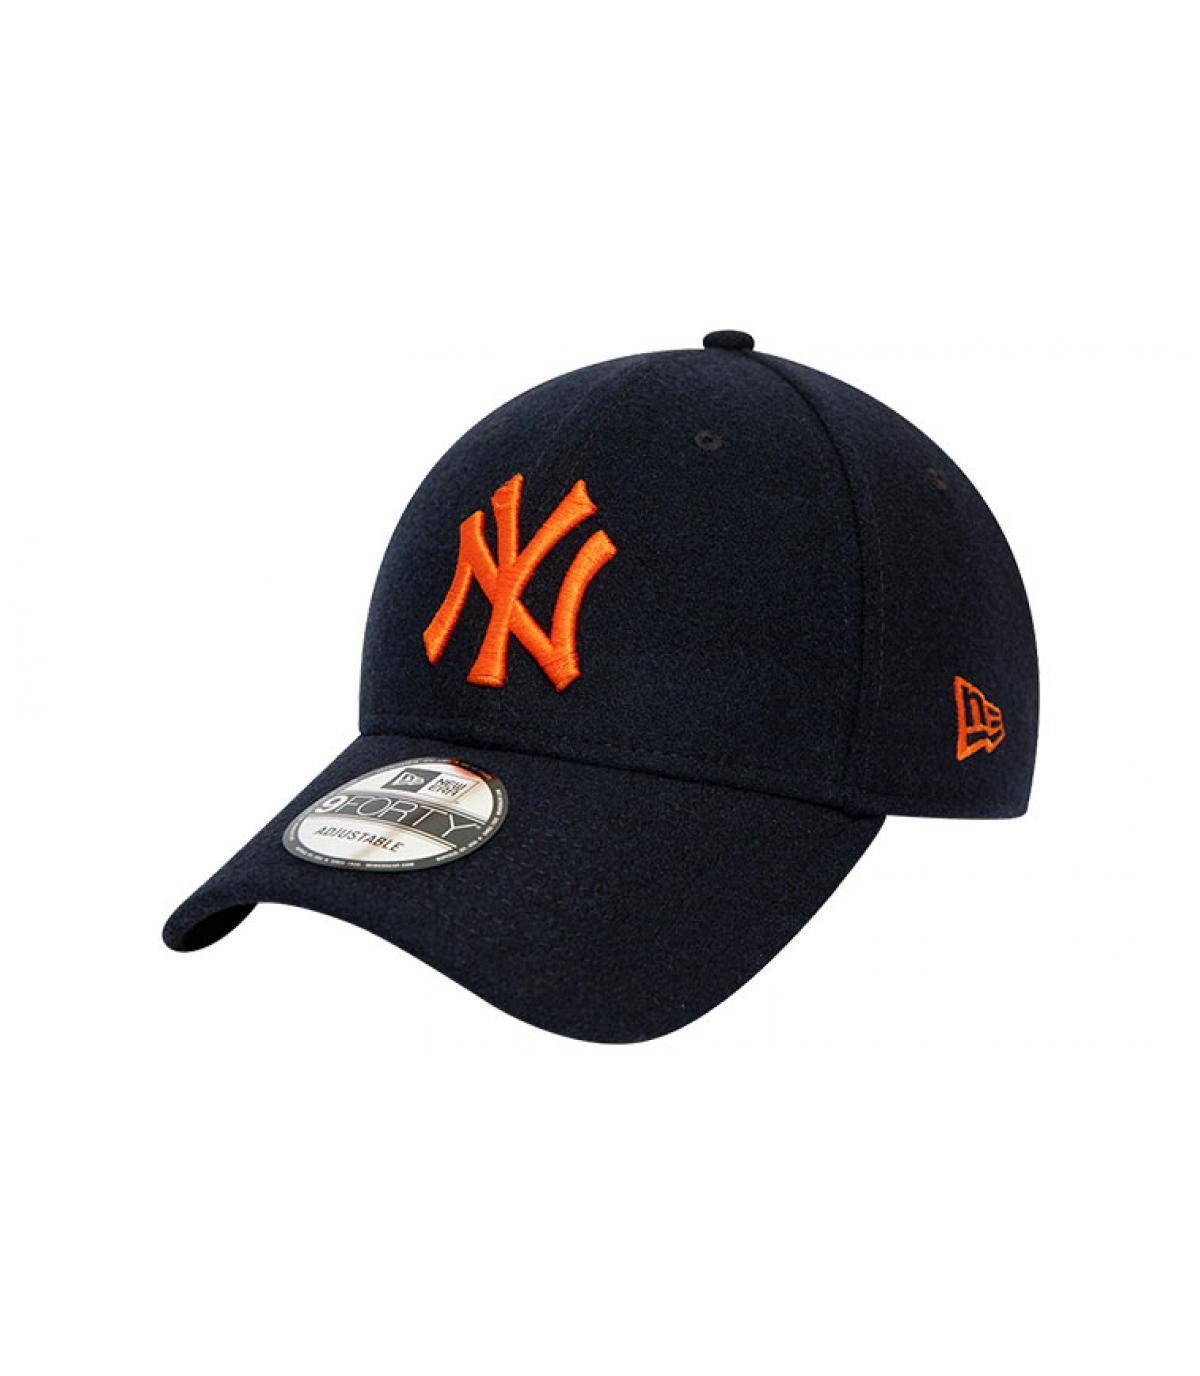 Details Cap Kids League Ess NY 940 black orange - Abbildung 2